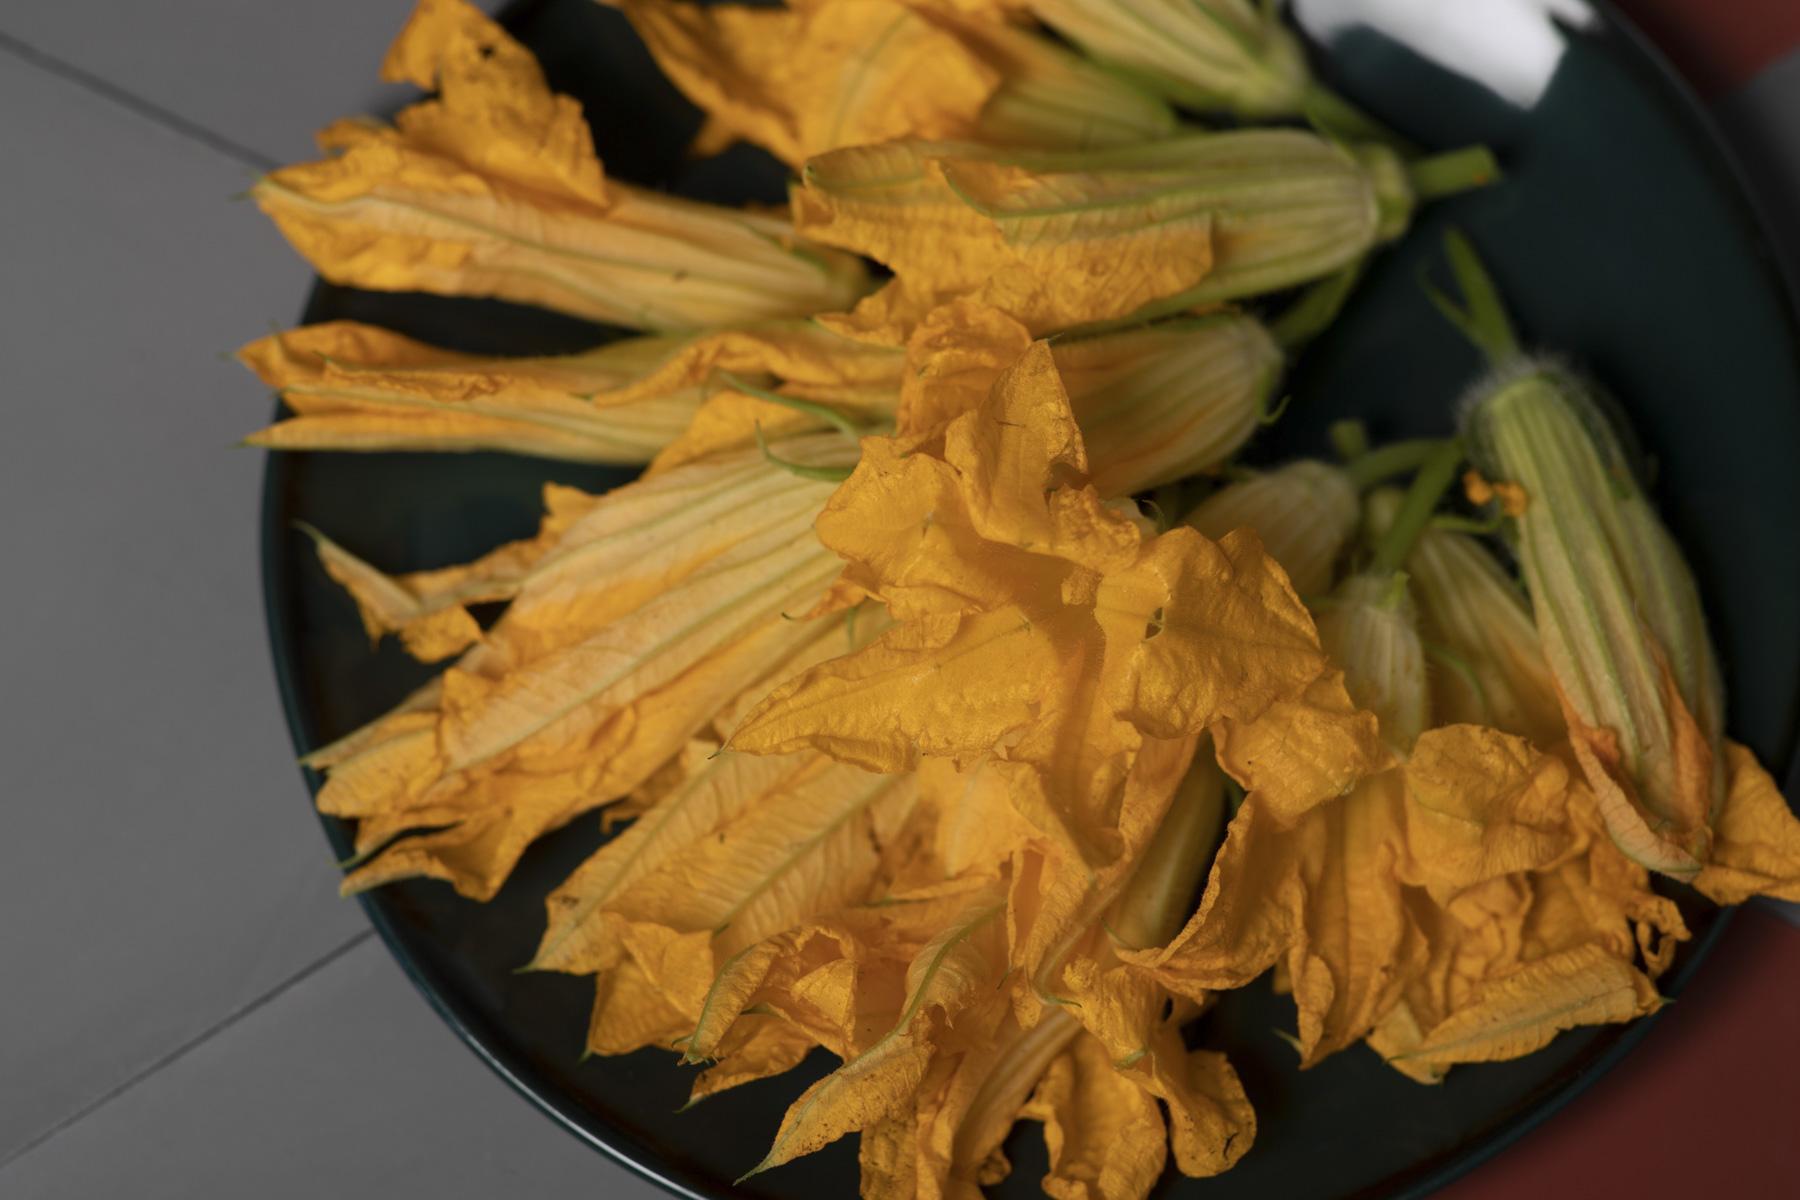 I fiori di zucca: sceglierli e cucinarli